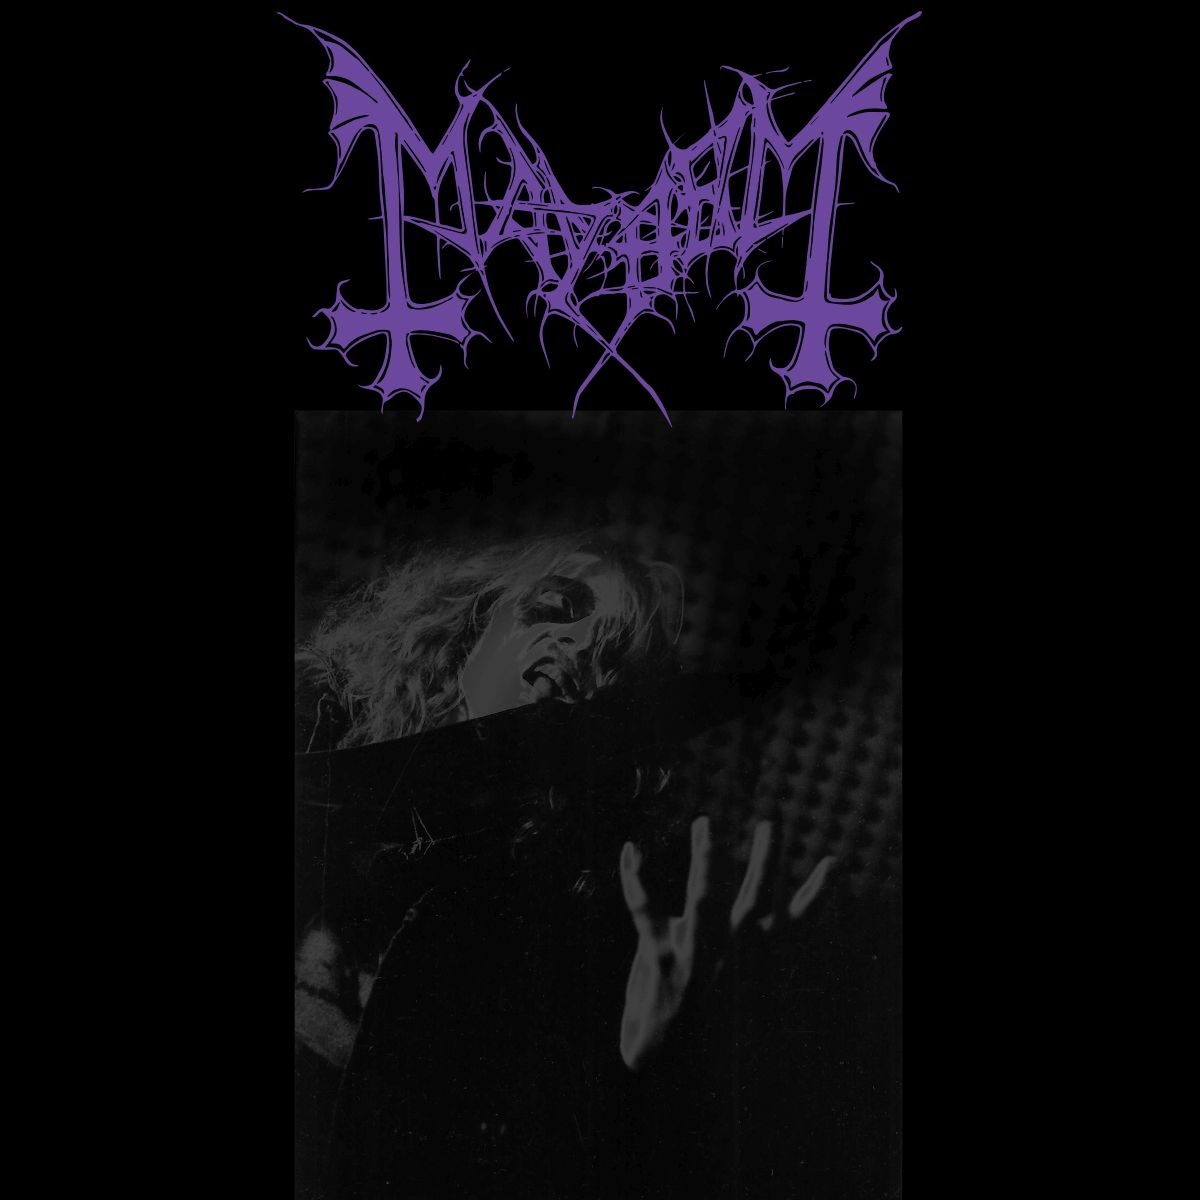 Live in Leipzig - Mayhem - Musik - PEACEVILLE - 0801056857019 - 4/12-2015